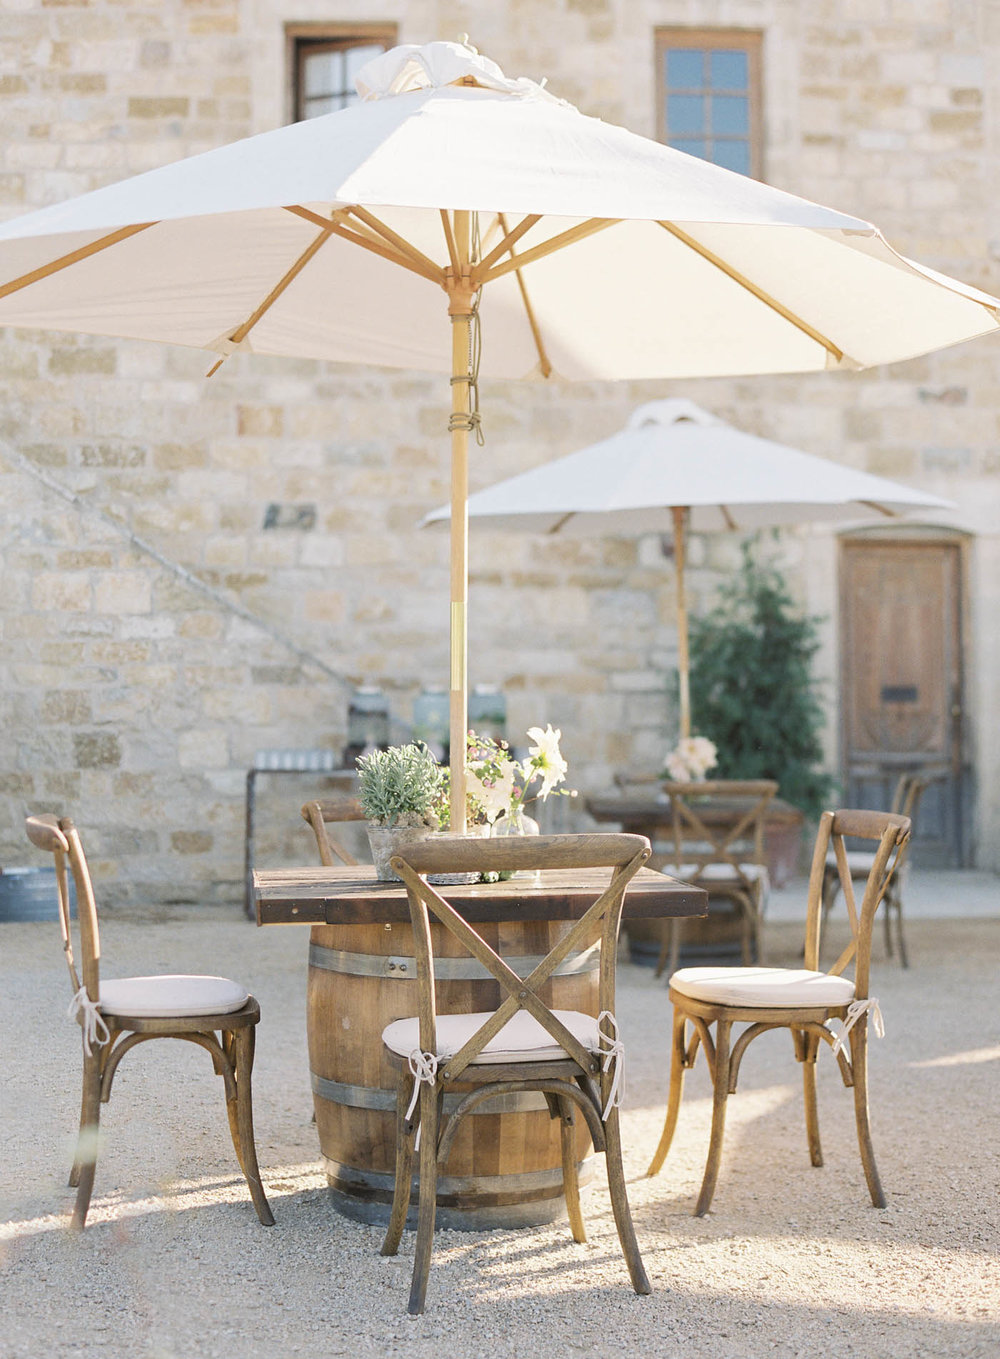 sunstone-villa-wedding-26-Jen_Huang-RD-164-Jen_Huang-009587-R1-010.jpg